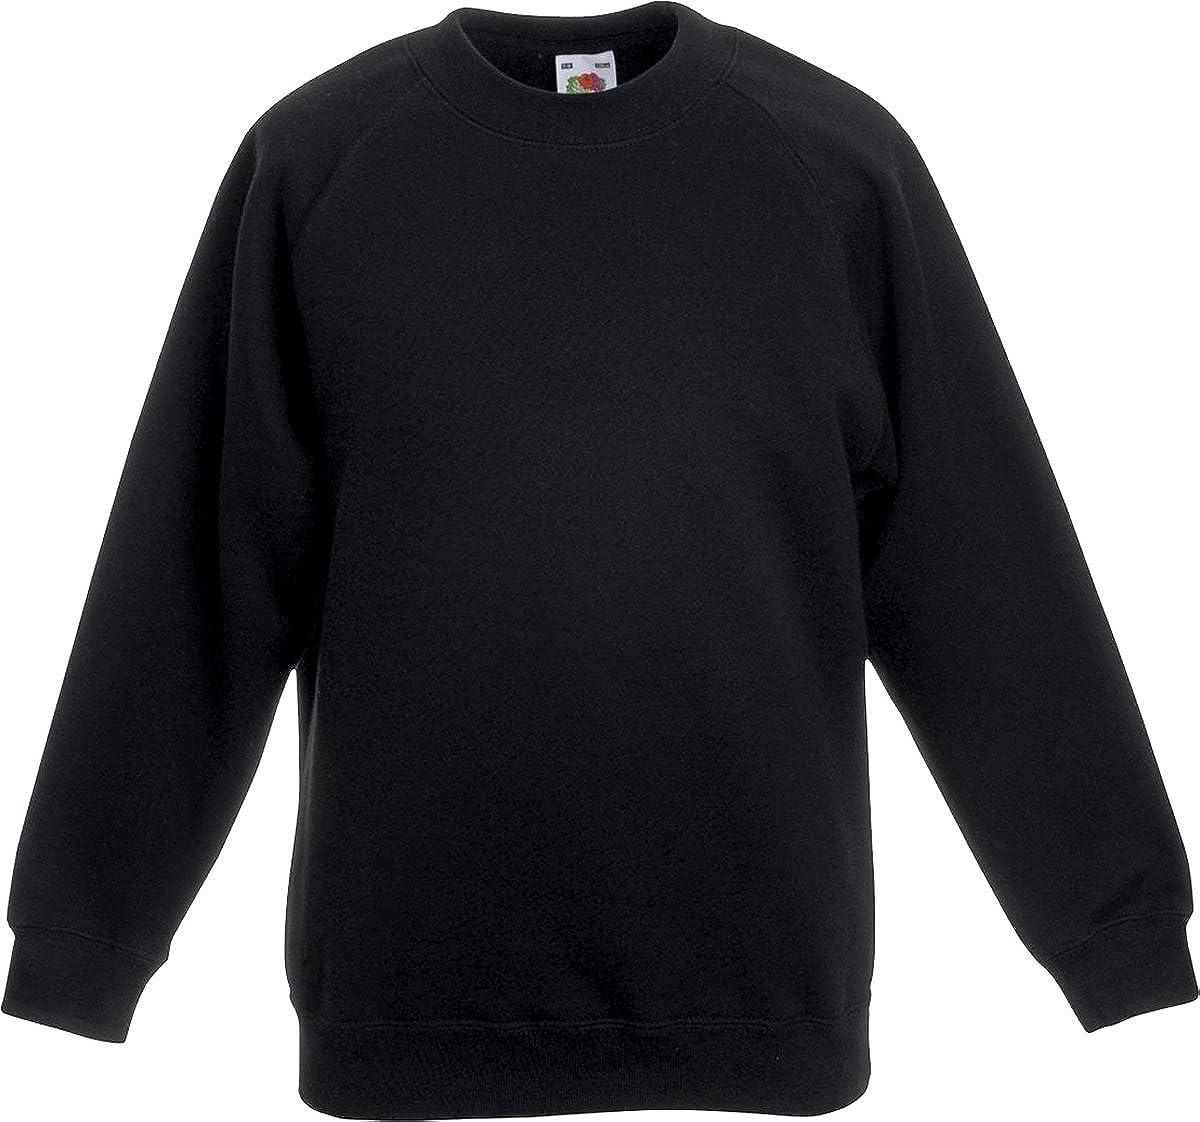 "Trutex Unisex Sweat Cardigan,Black 7-8 Years School Uniform-Size 23-25/"" Chest"